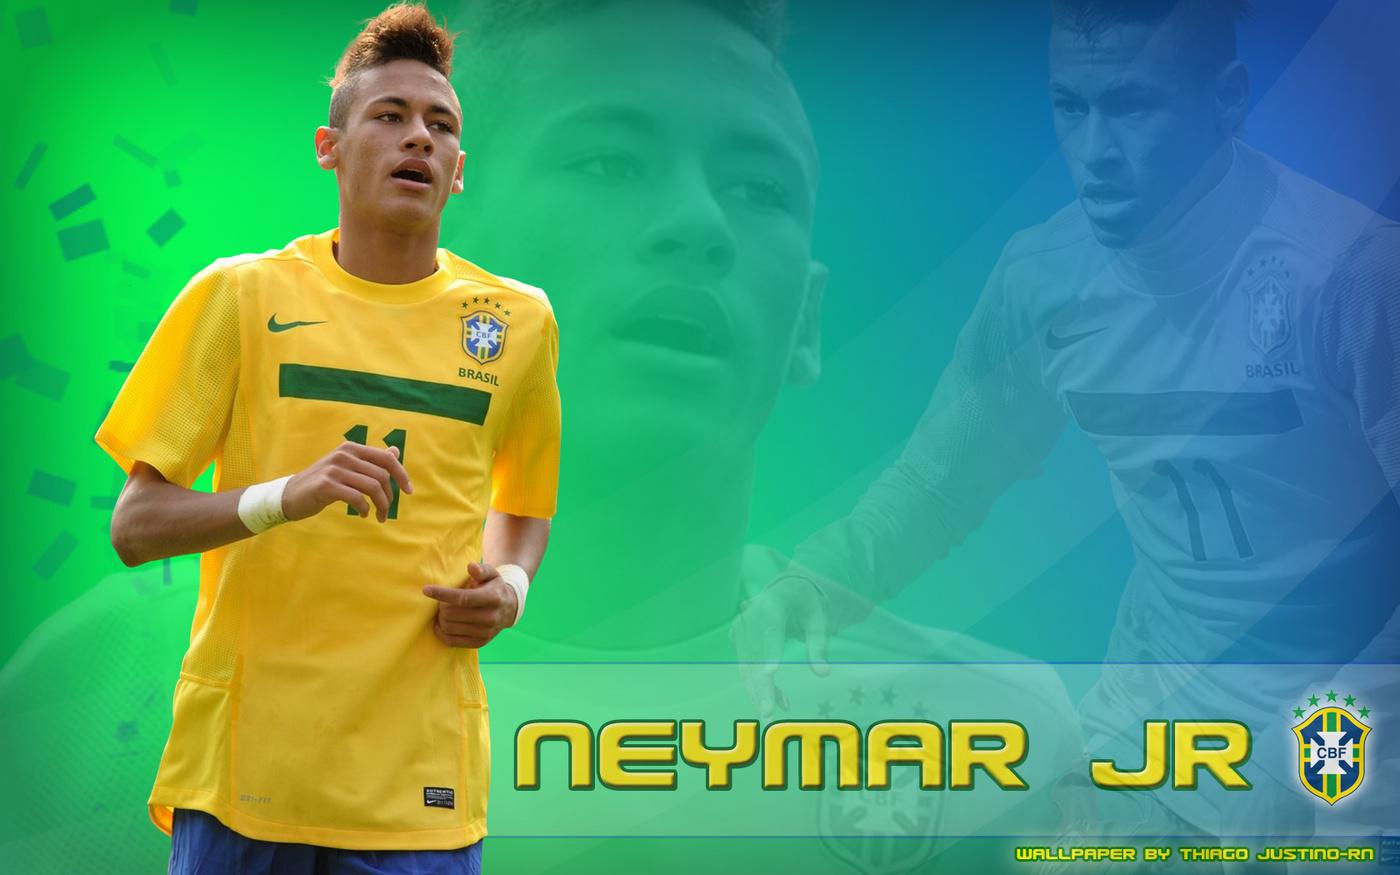 http://1.bp.blogspot.com/-5f4_2Ta5hEo/TkK9qDvpeeI/AAAAAAAACuk/GUSQm0kso4w/s1600/Neymar-Wallpaper-2011-5.jpg